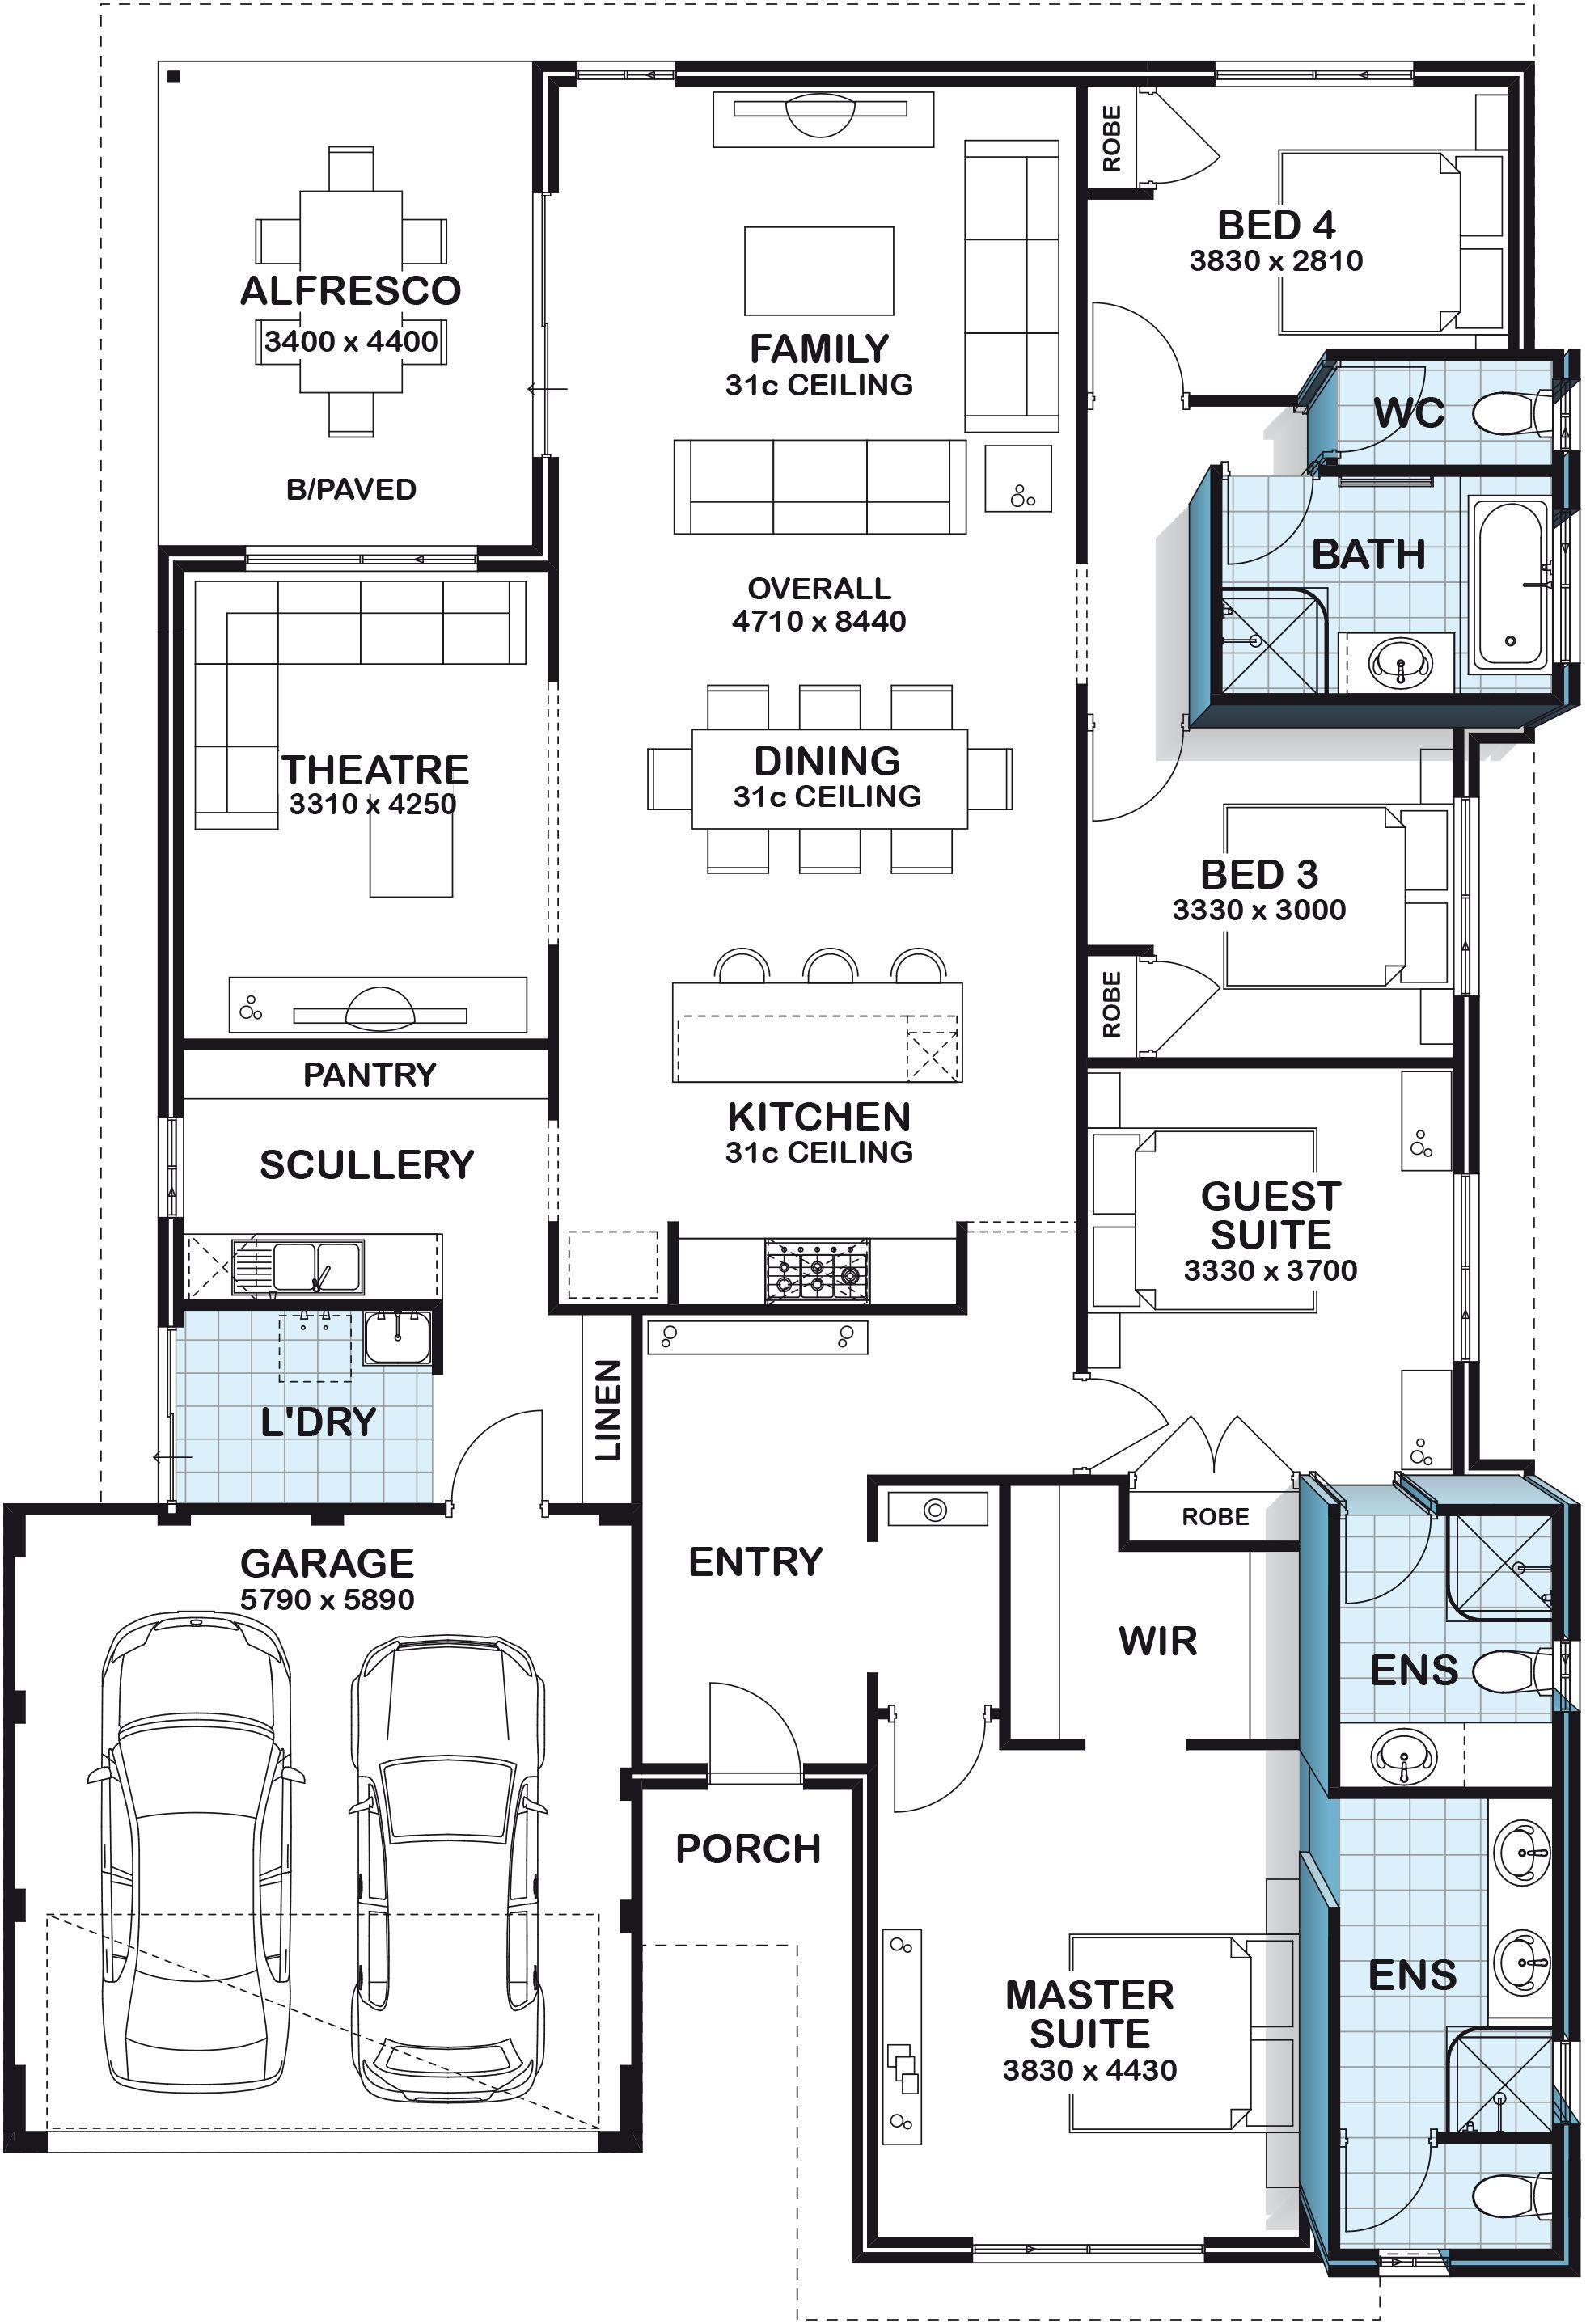 Home Designs Perth House Plans Perth Australis House Plans Bedroom House Plans House Blueprints